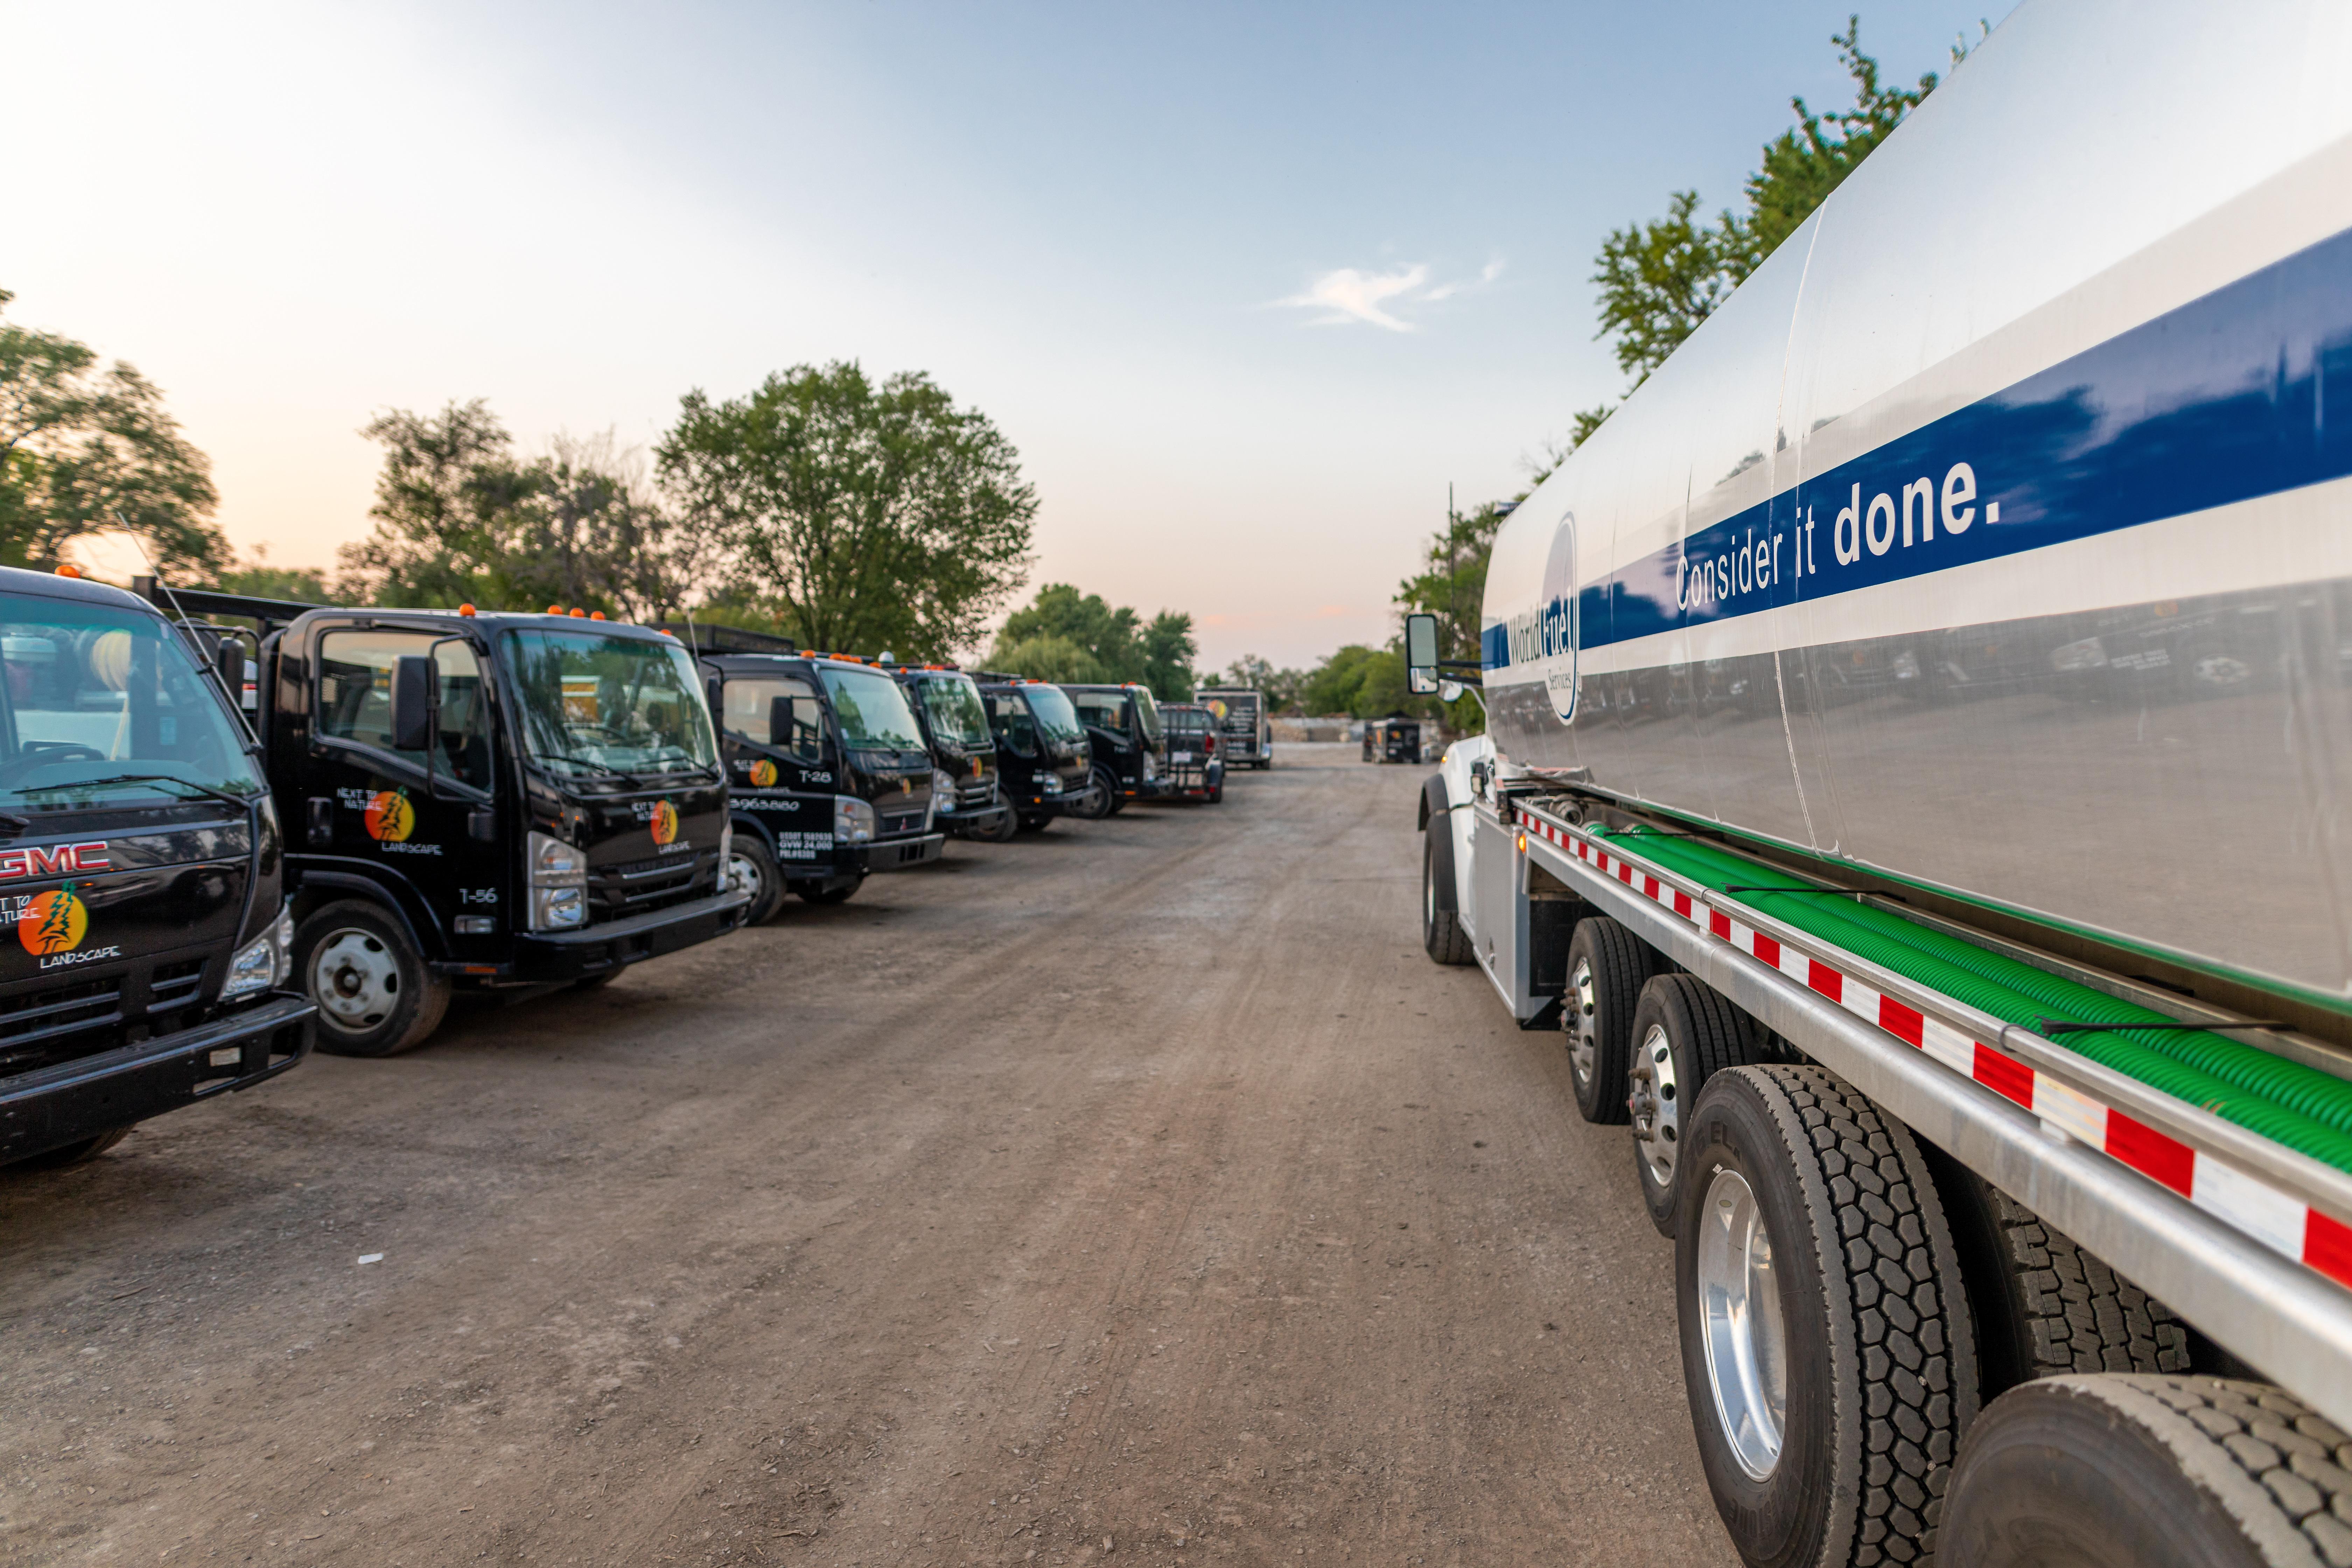 fleet fueling truck on site